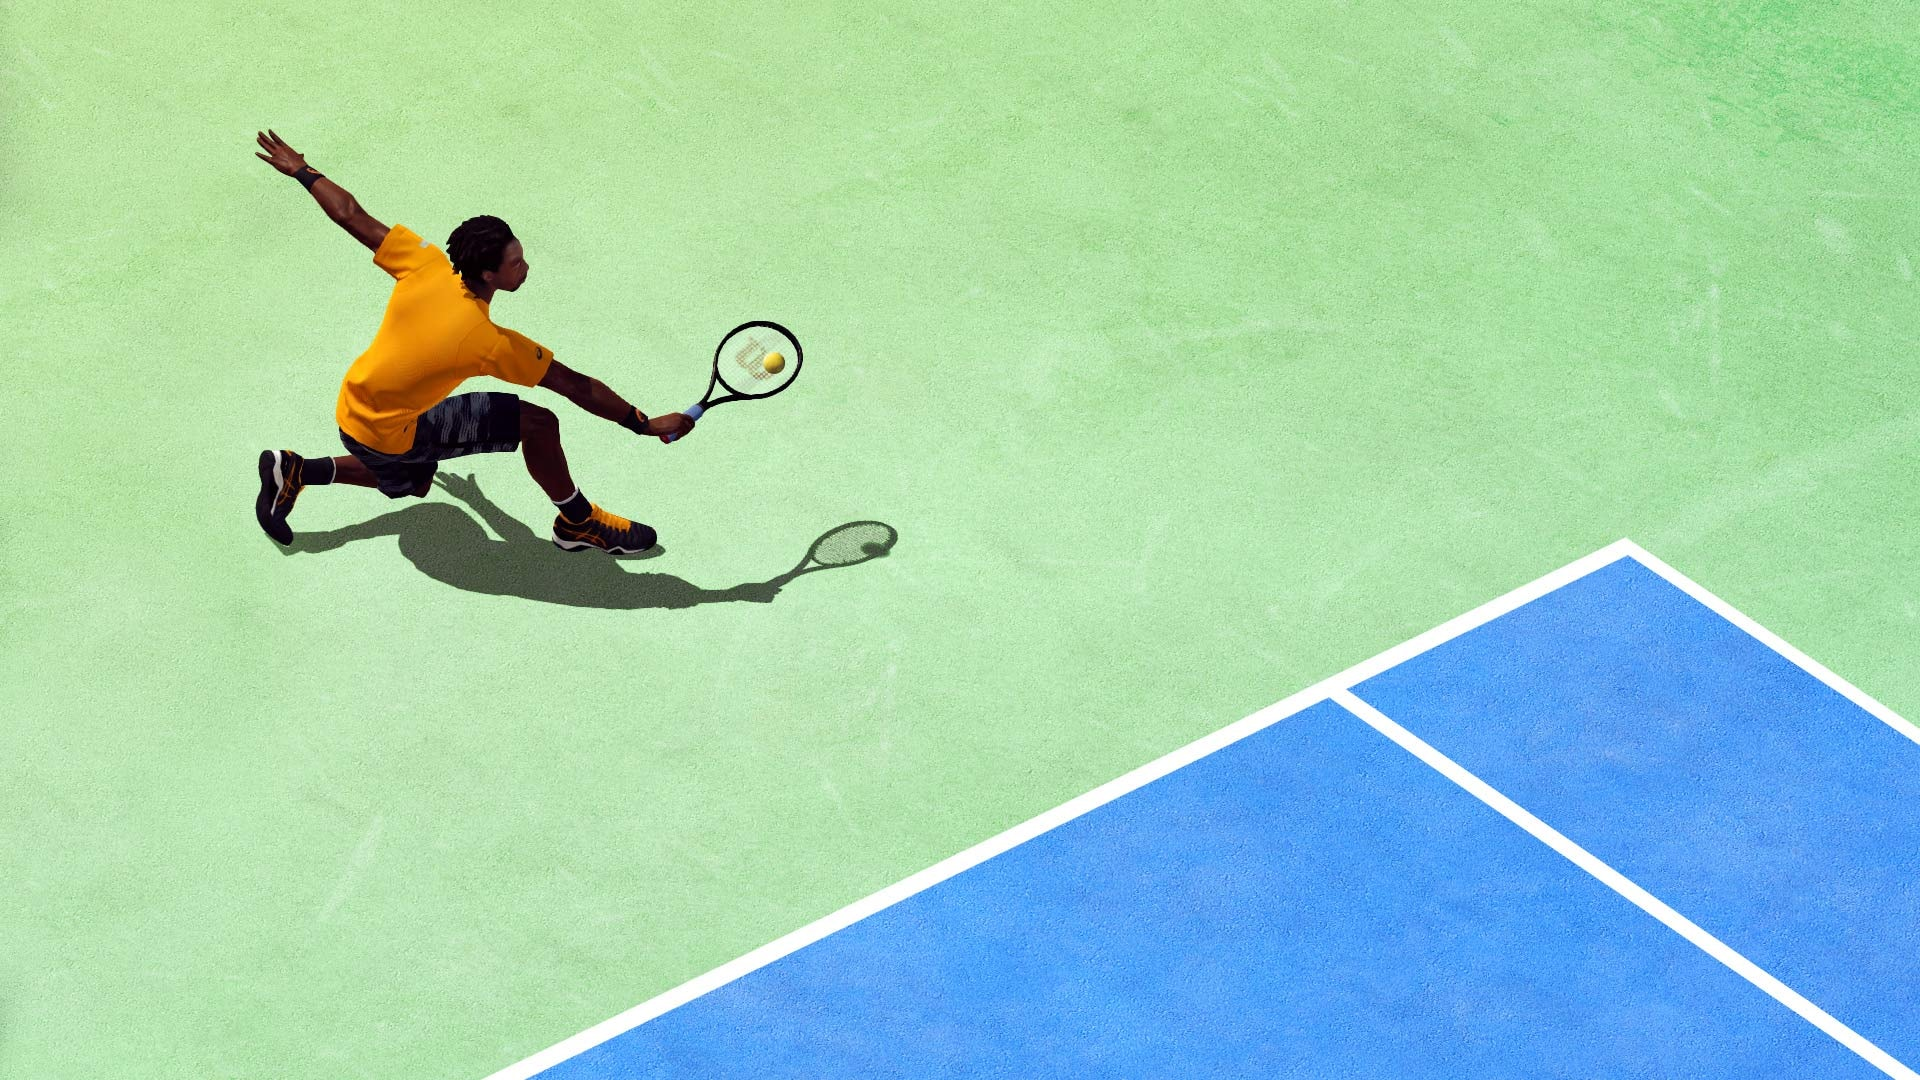 Giochi tennis gratis